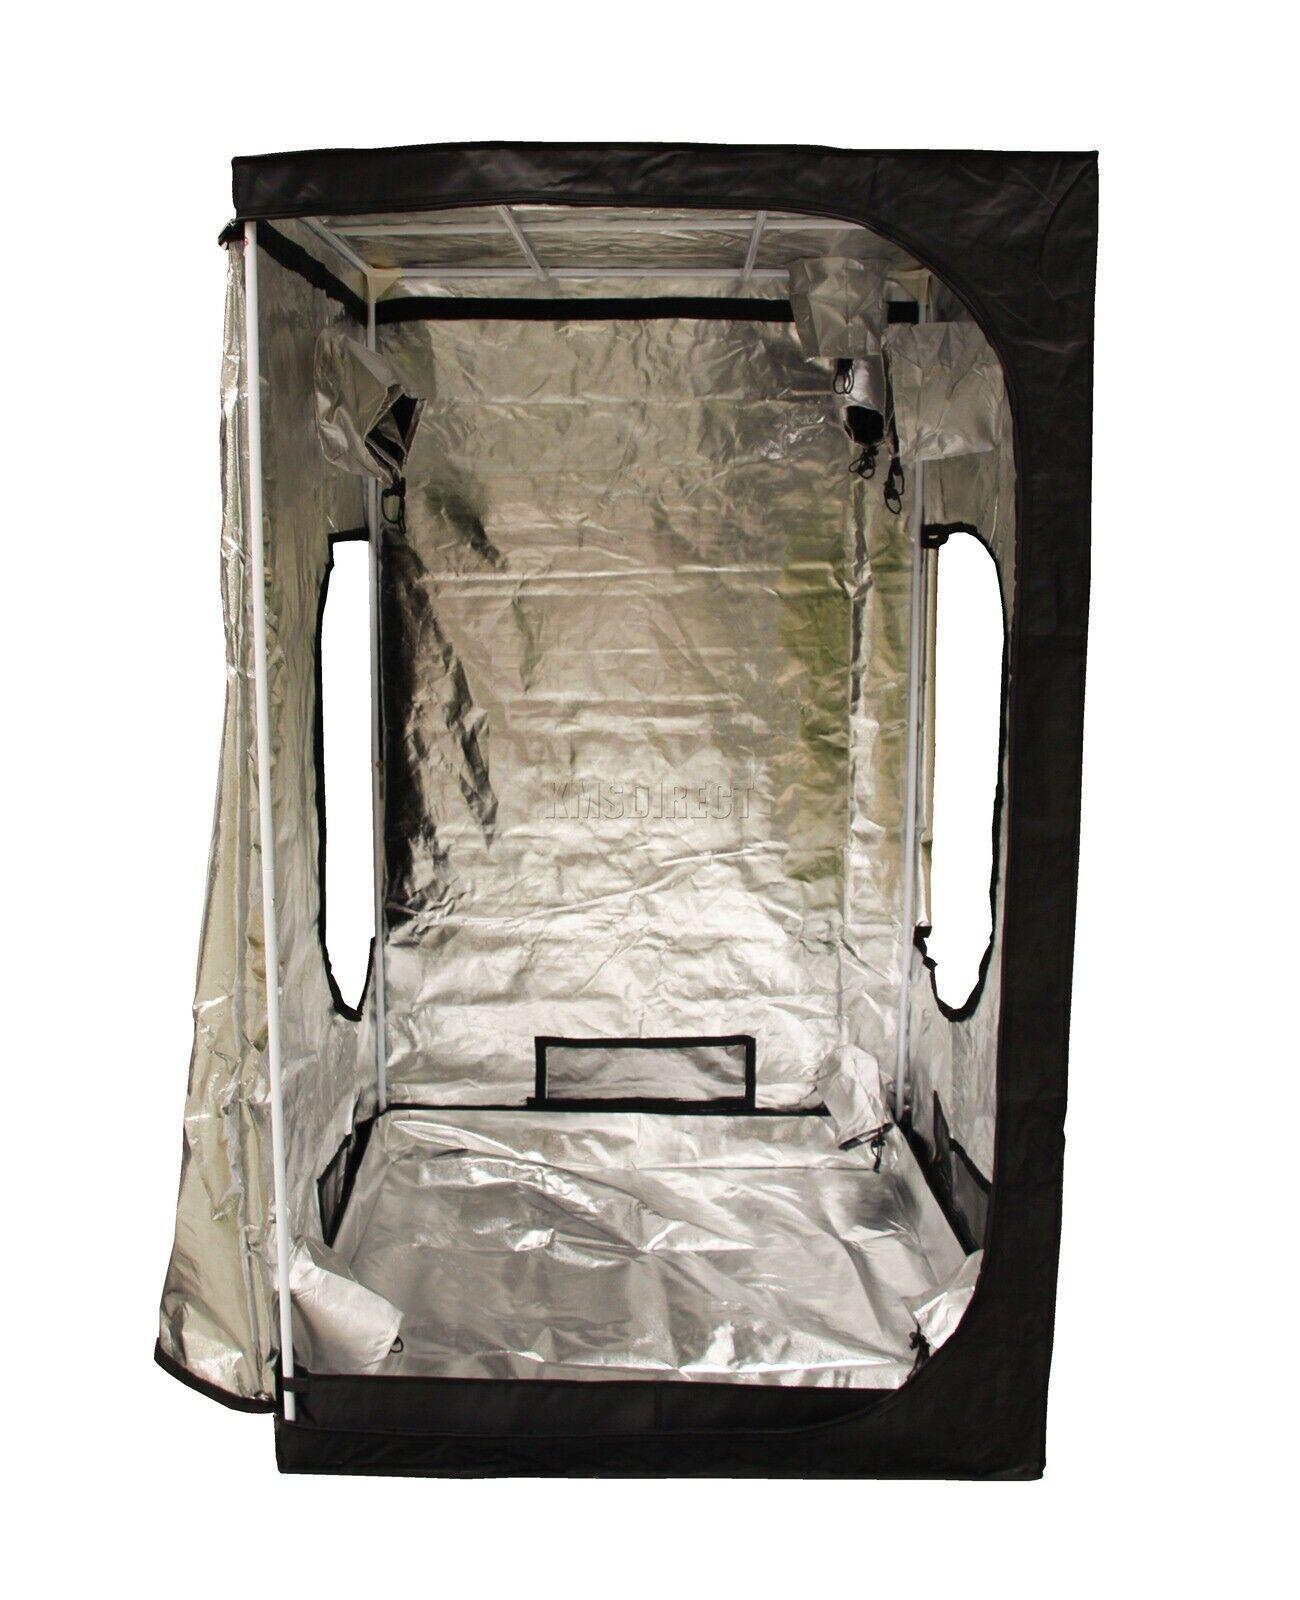 Nuevo diseño de 1.2 X 1.2 X 2m portátil Grow Tent Plata Mylar Hydroponic Cuarto Oscuro